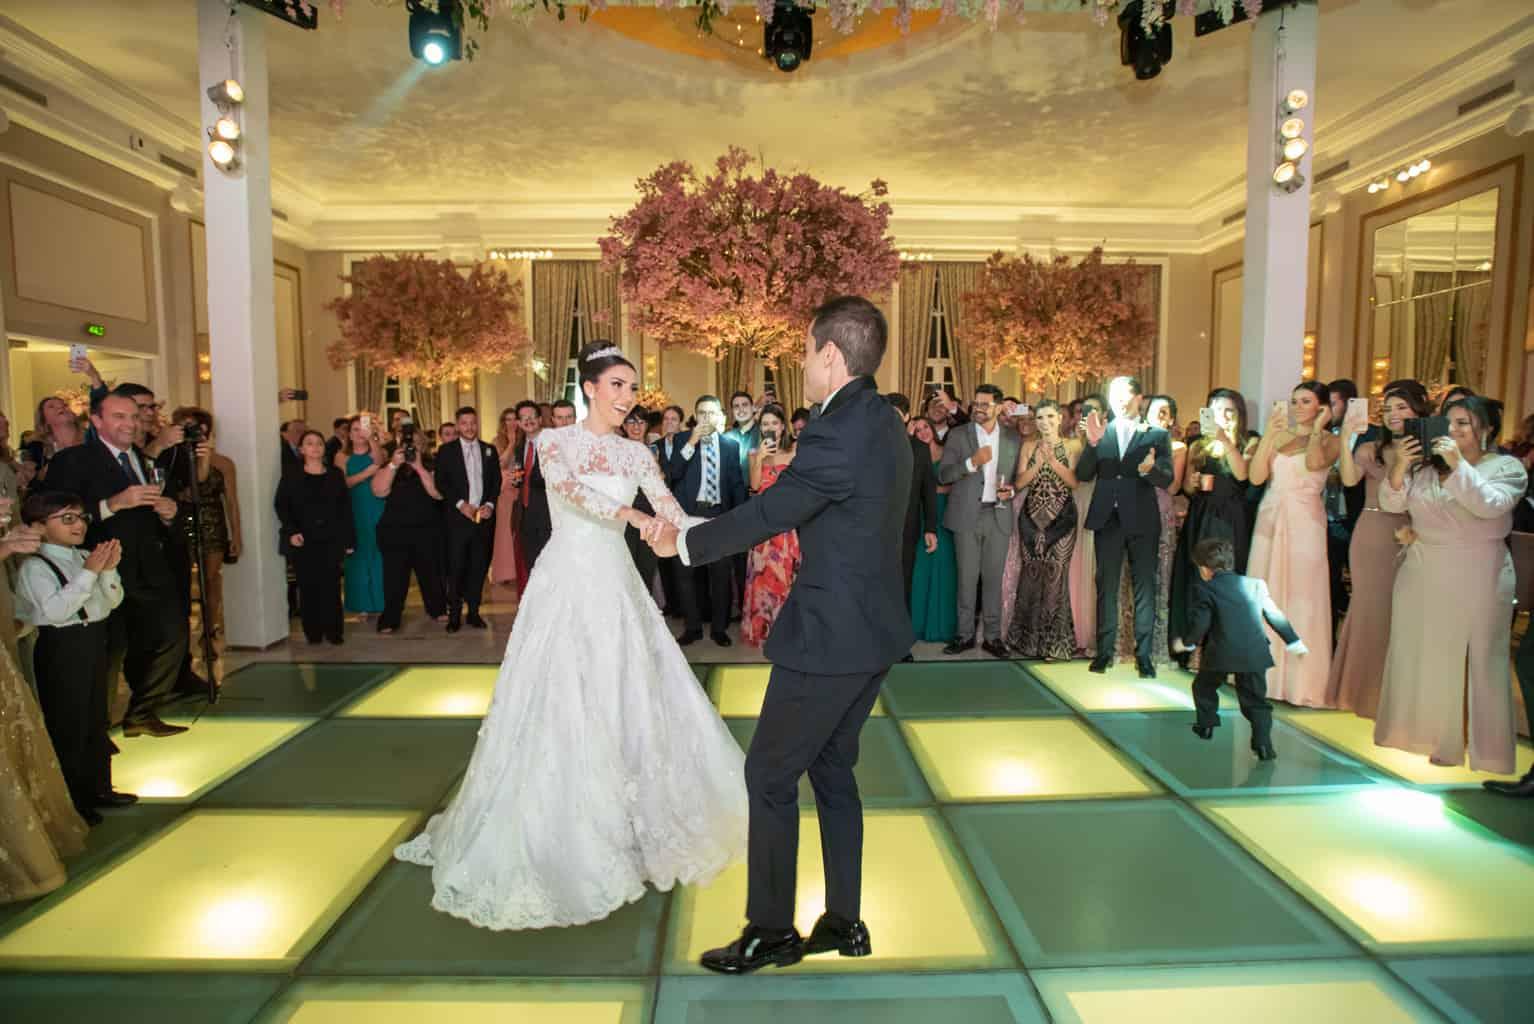 casamento-Patricia-e-Thiago-Copacabana-Palace-Daniel-Curz-A-Roseira-Paula-Rocha-Marina-Fava-festa1410-Patricia-e-Thiago-MFF_1546